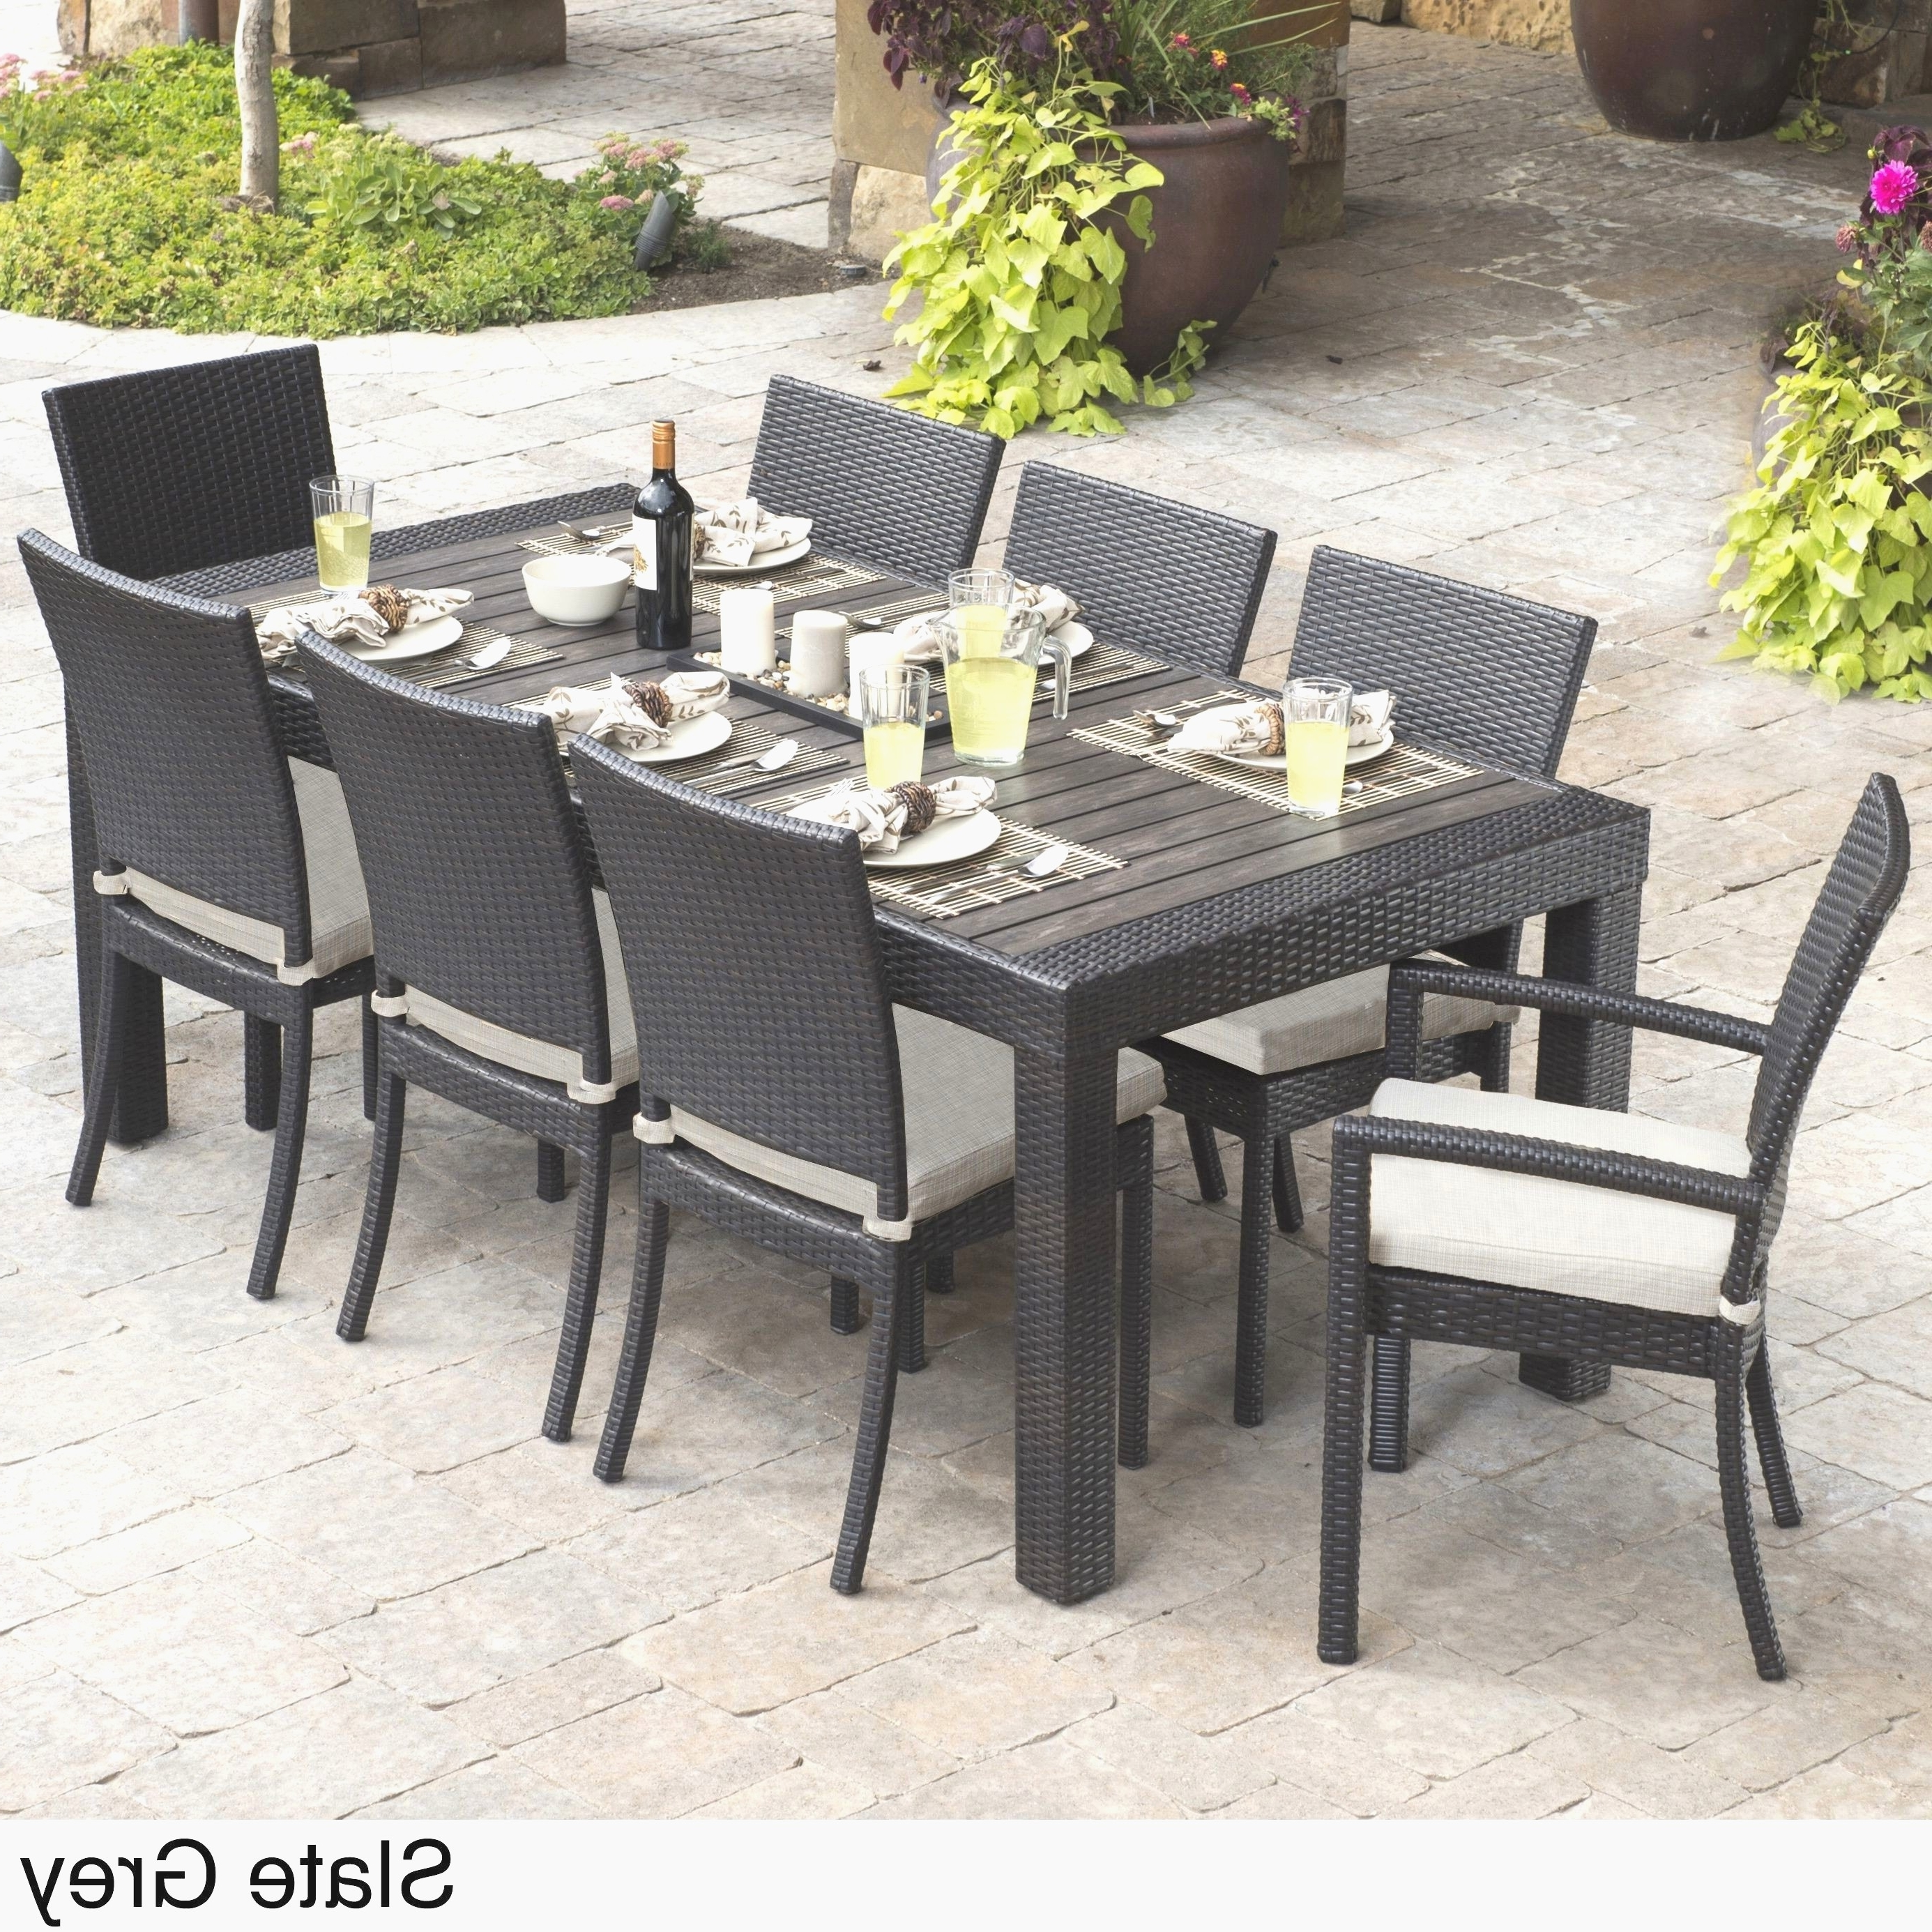 Expensive Patio Umbrellas With 2019 Eucalyptus Patio Furniture New Expensive Garden Furniture Expensive (View 14 of 20)